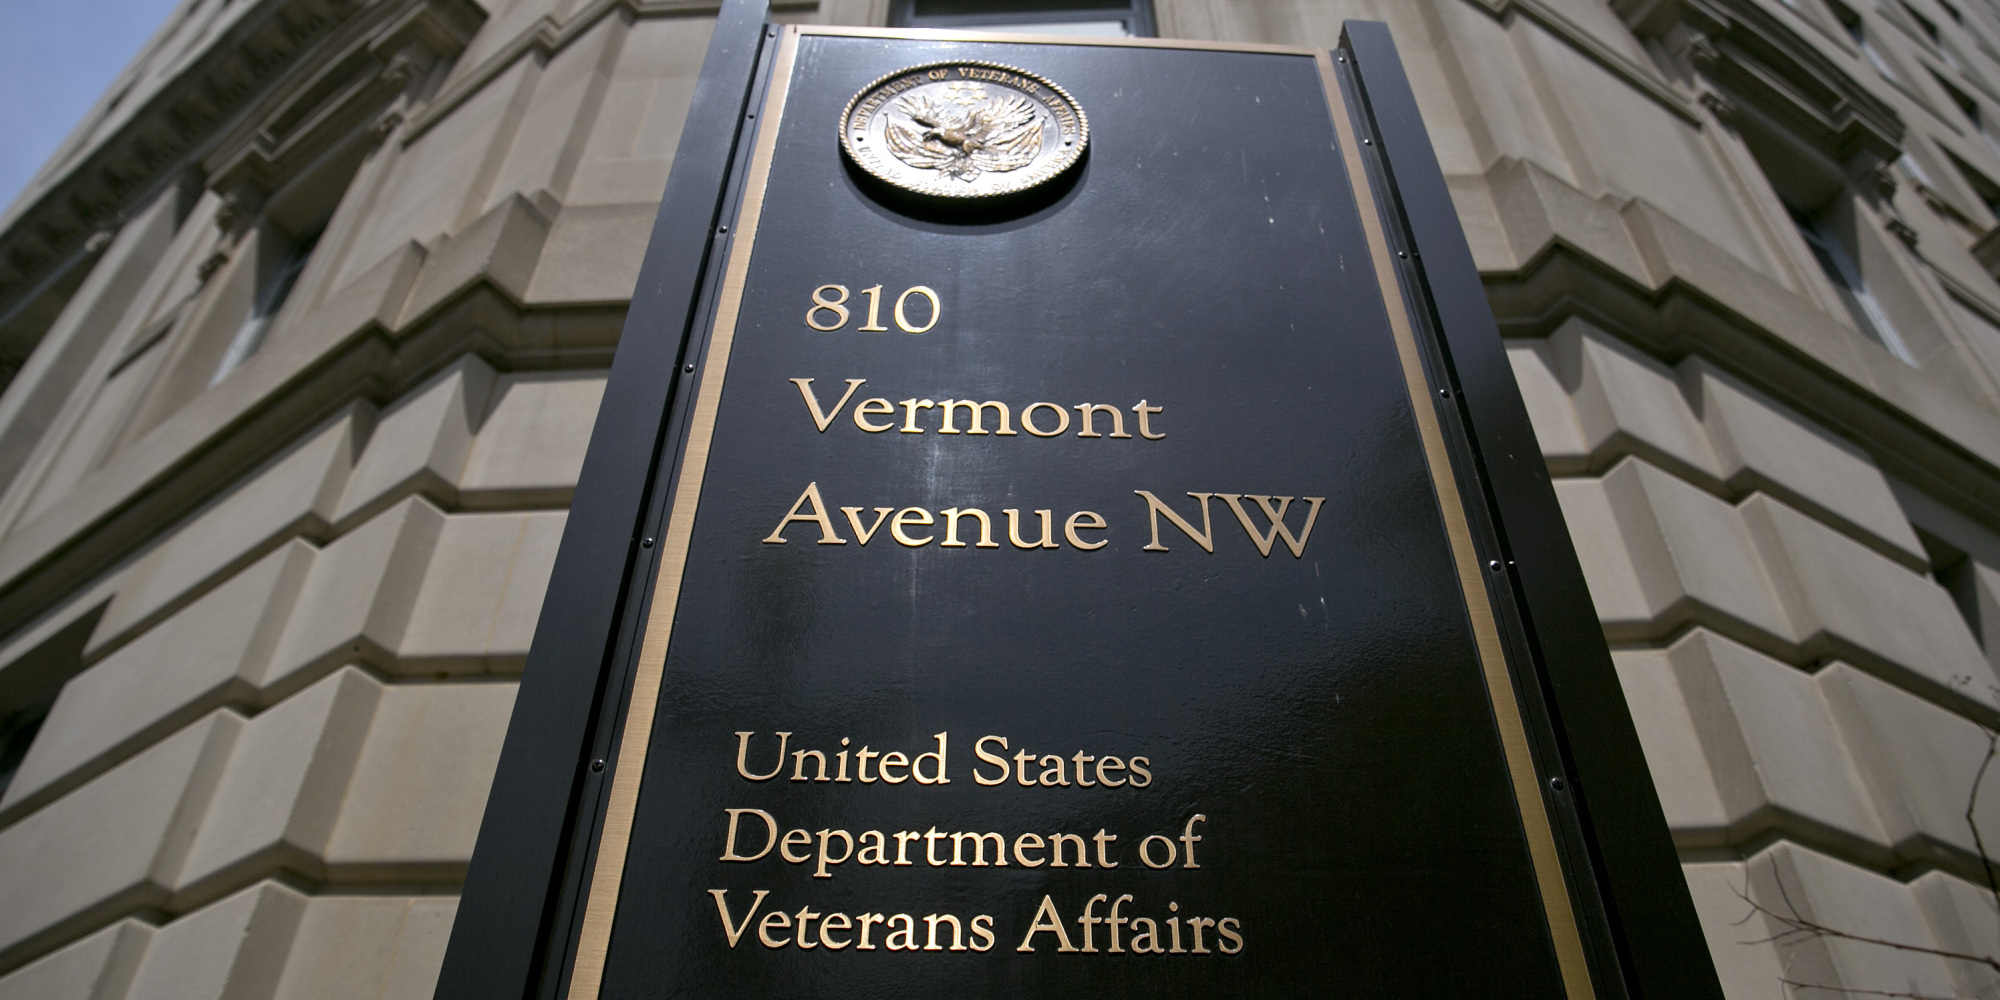 Agency Delays $765 Million in Spending for U.S. Veterans' Care